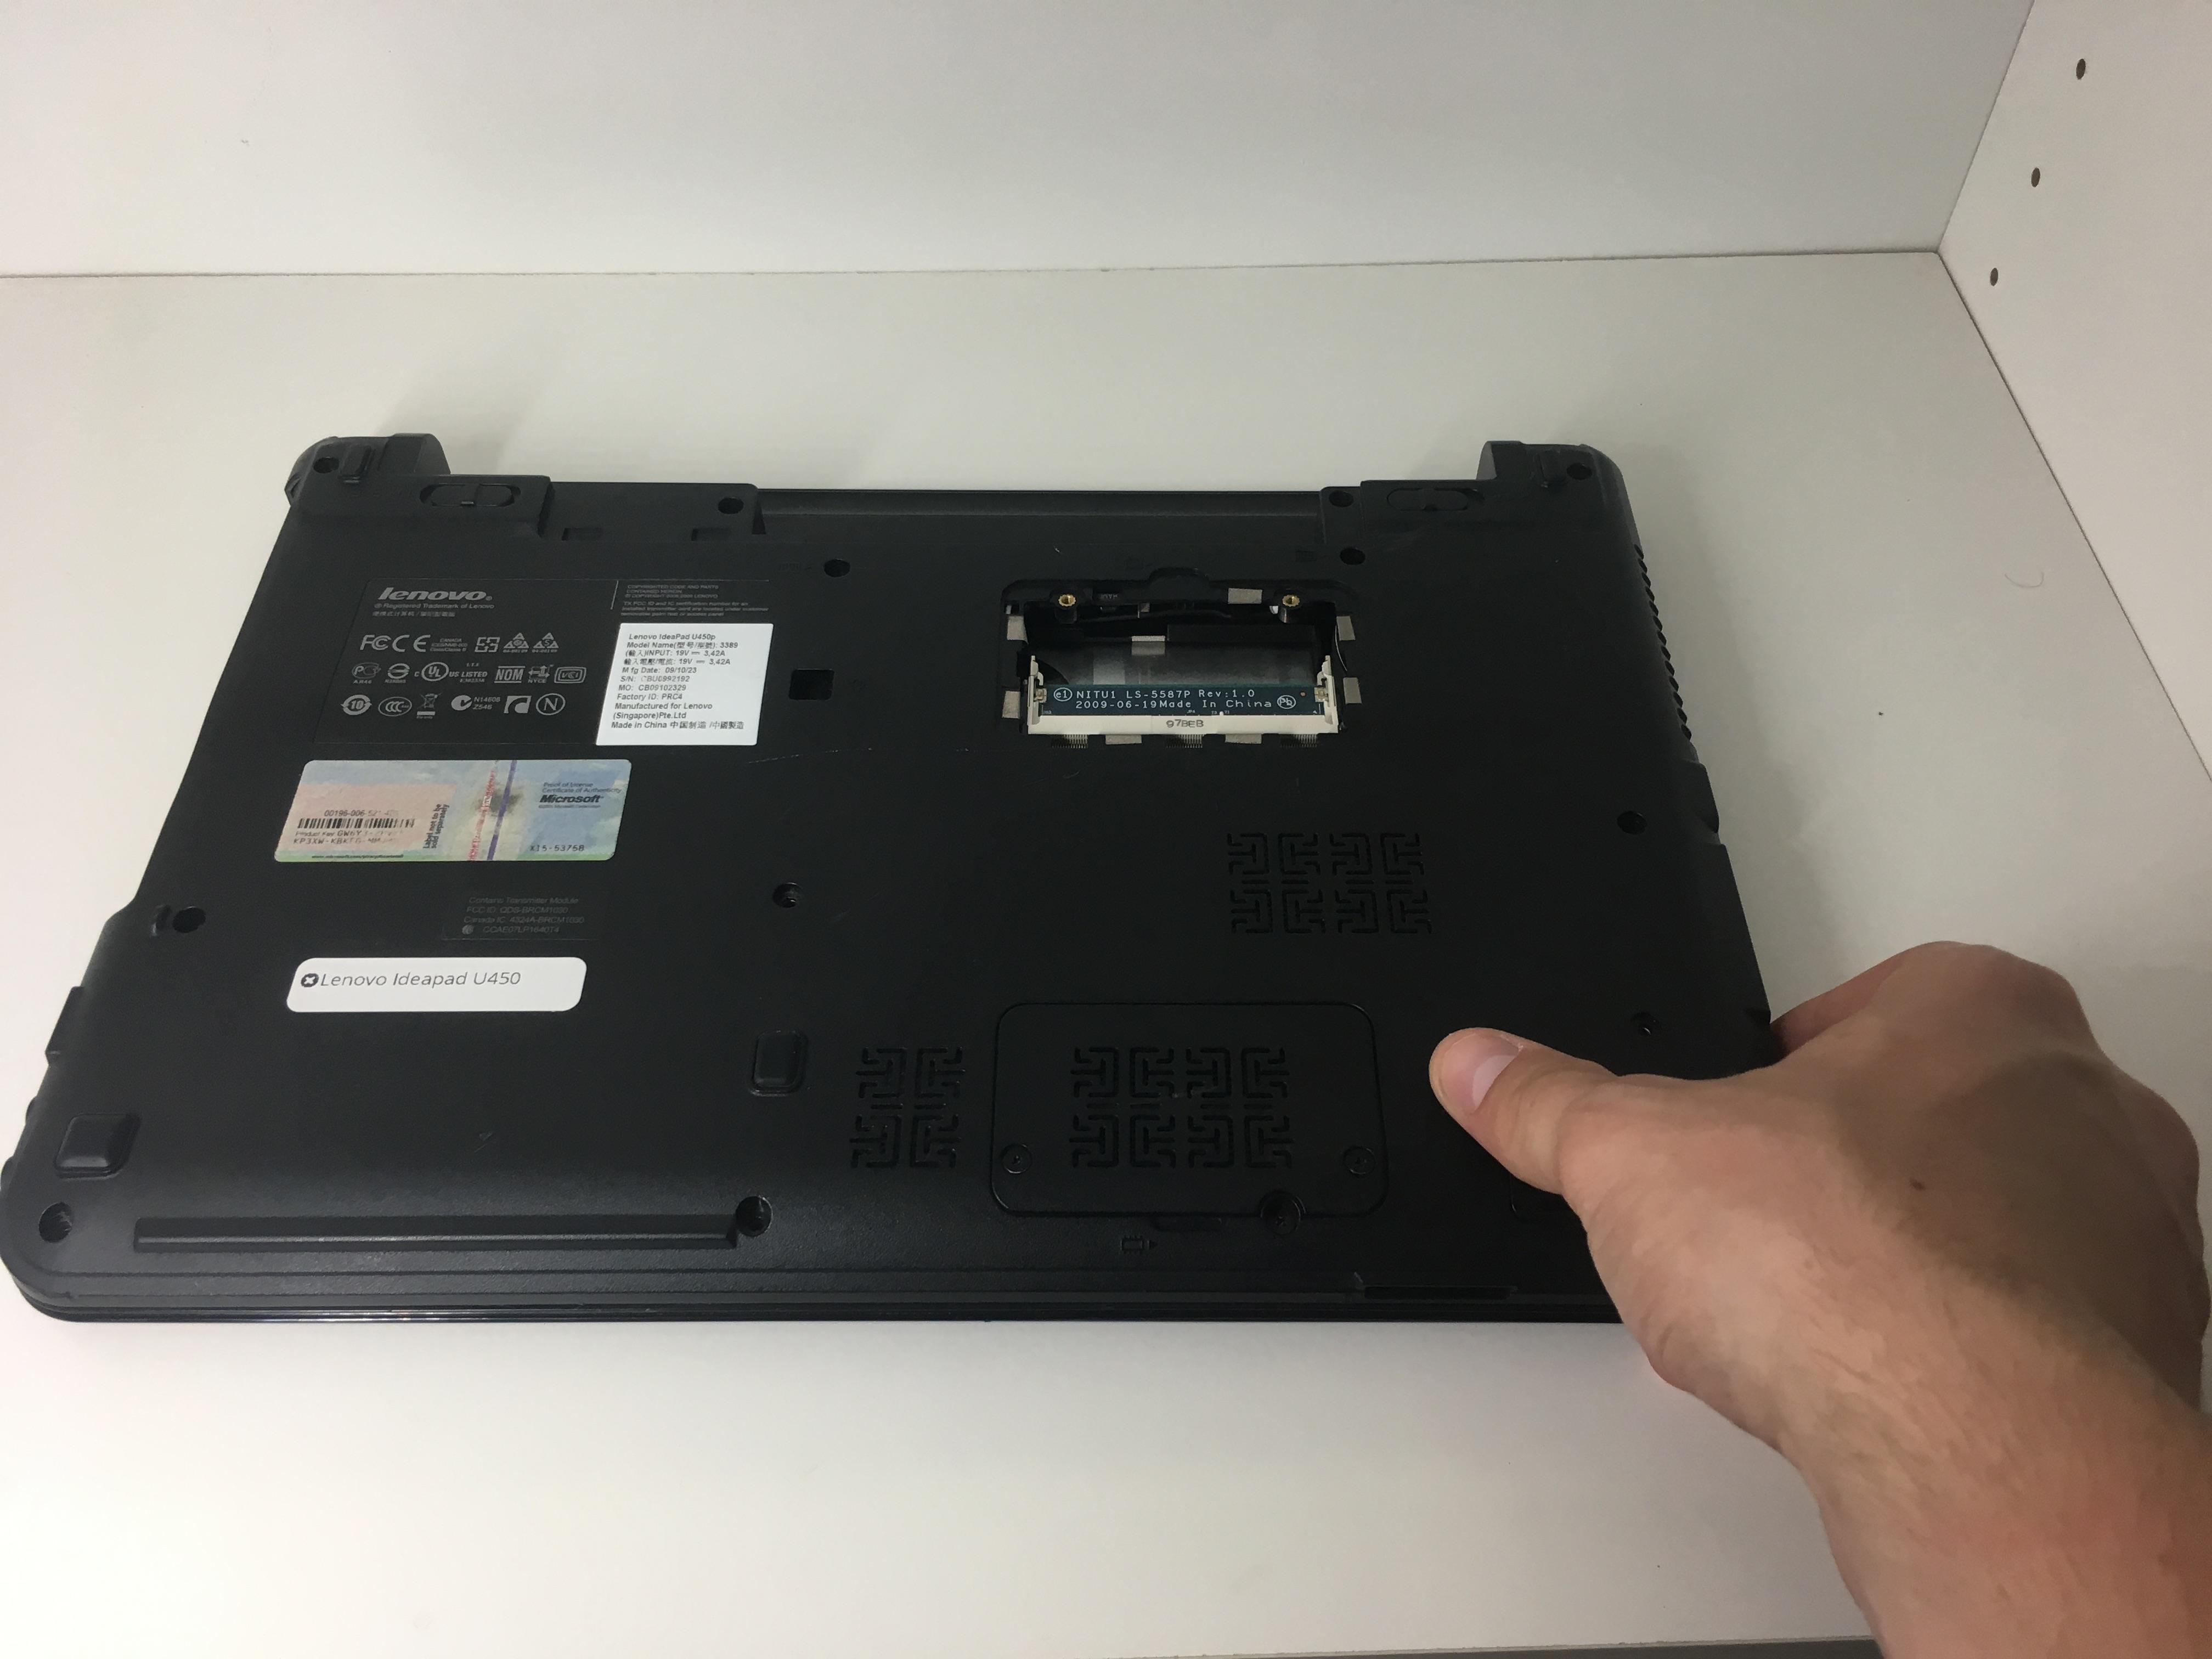 Lenovo IdeaPad U450 Battery Removal - iFixit Repair Guide